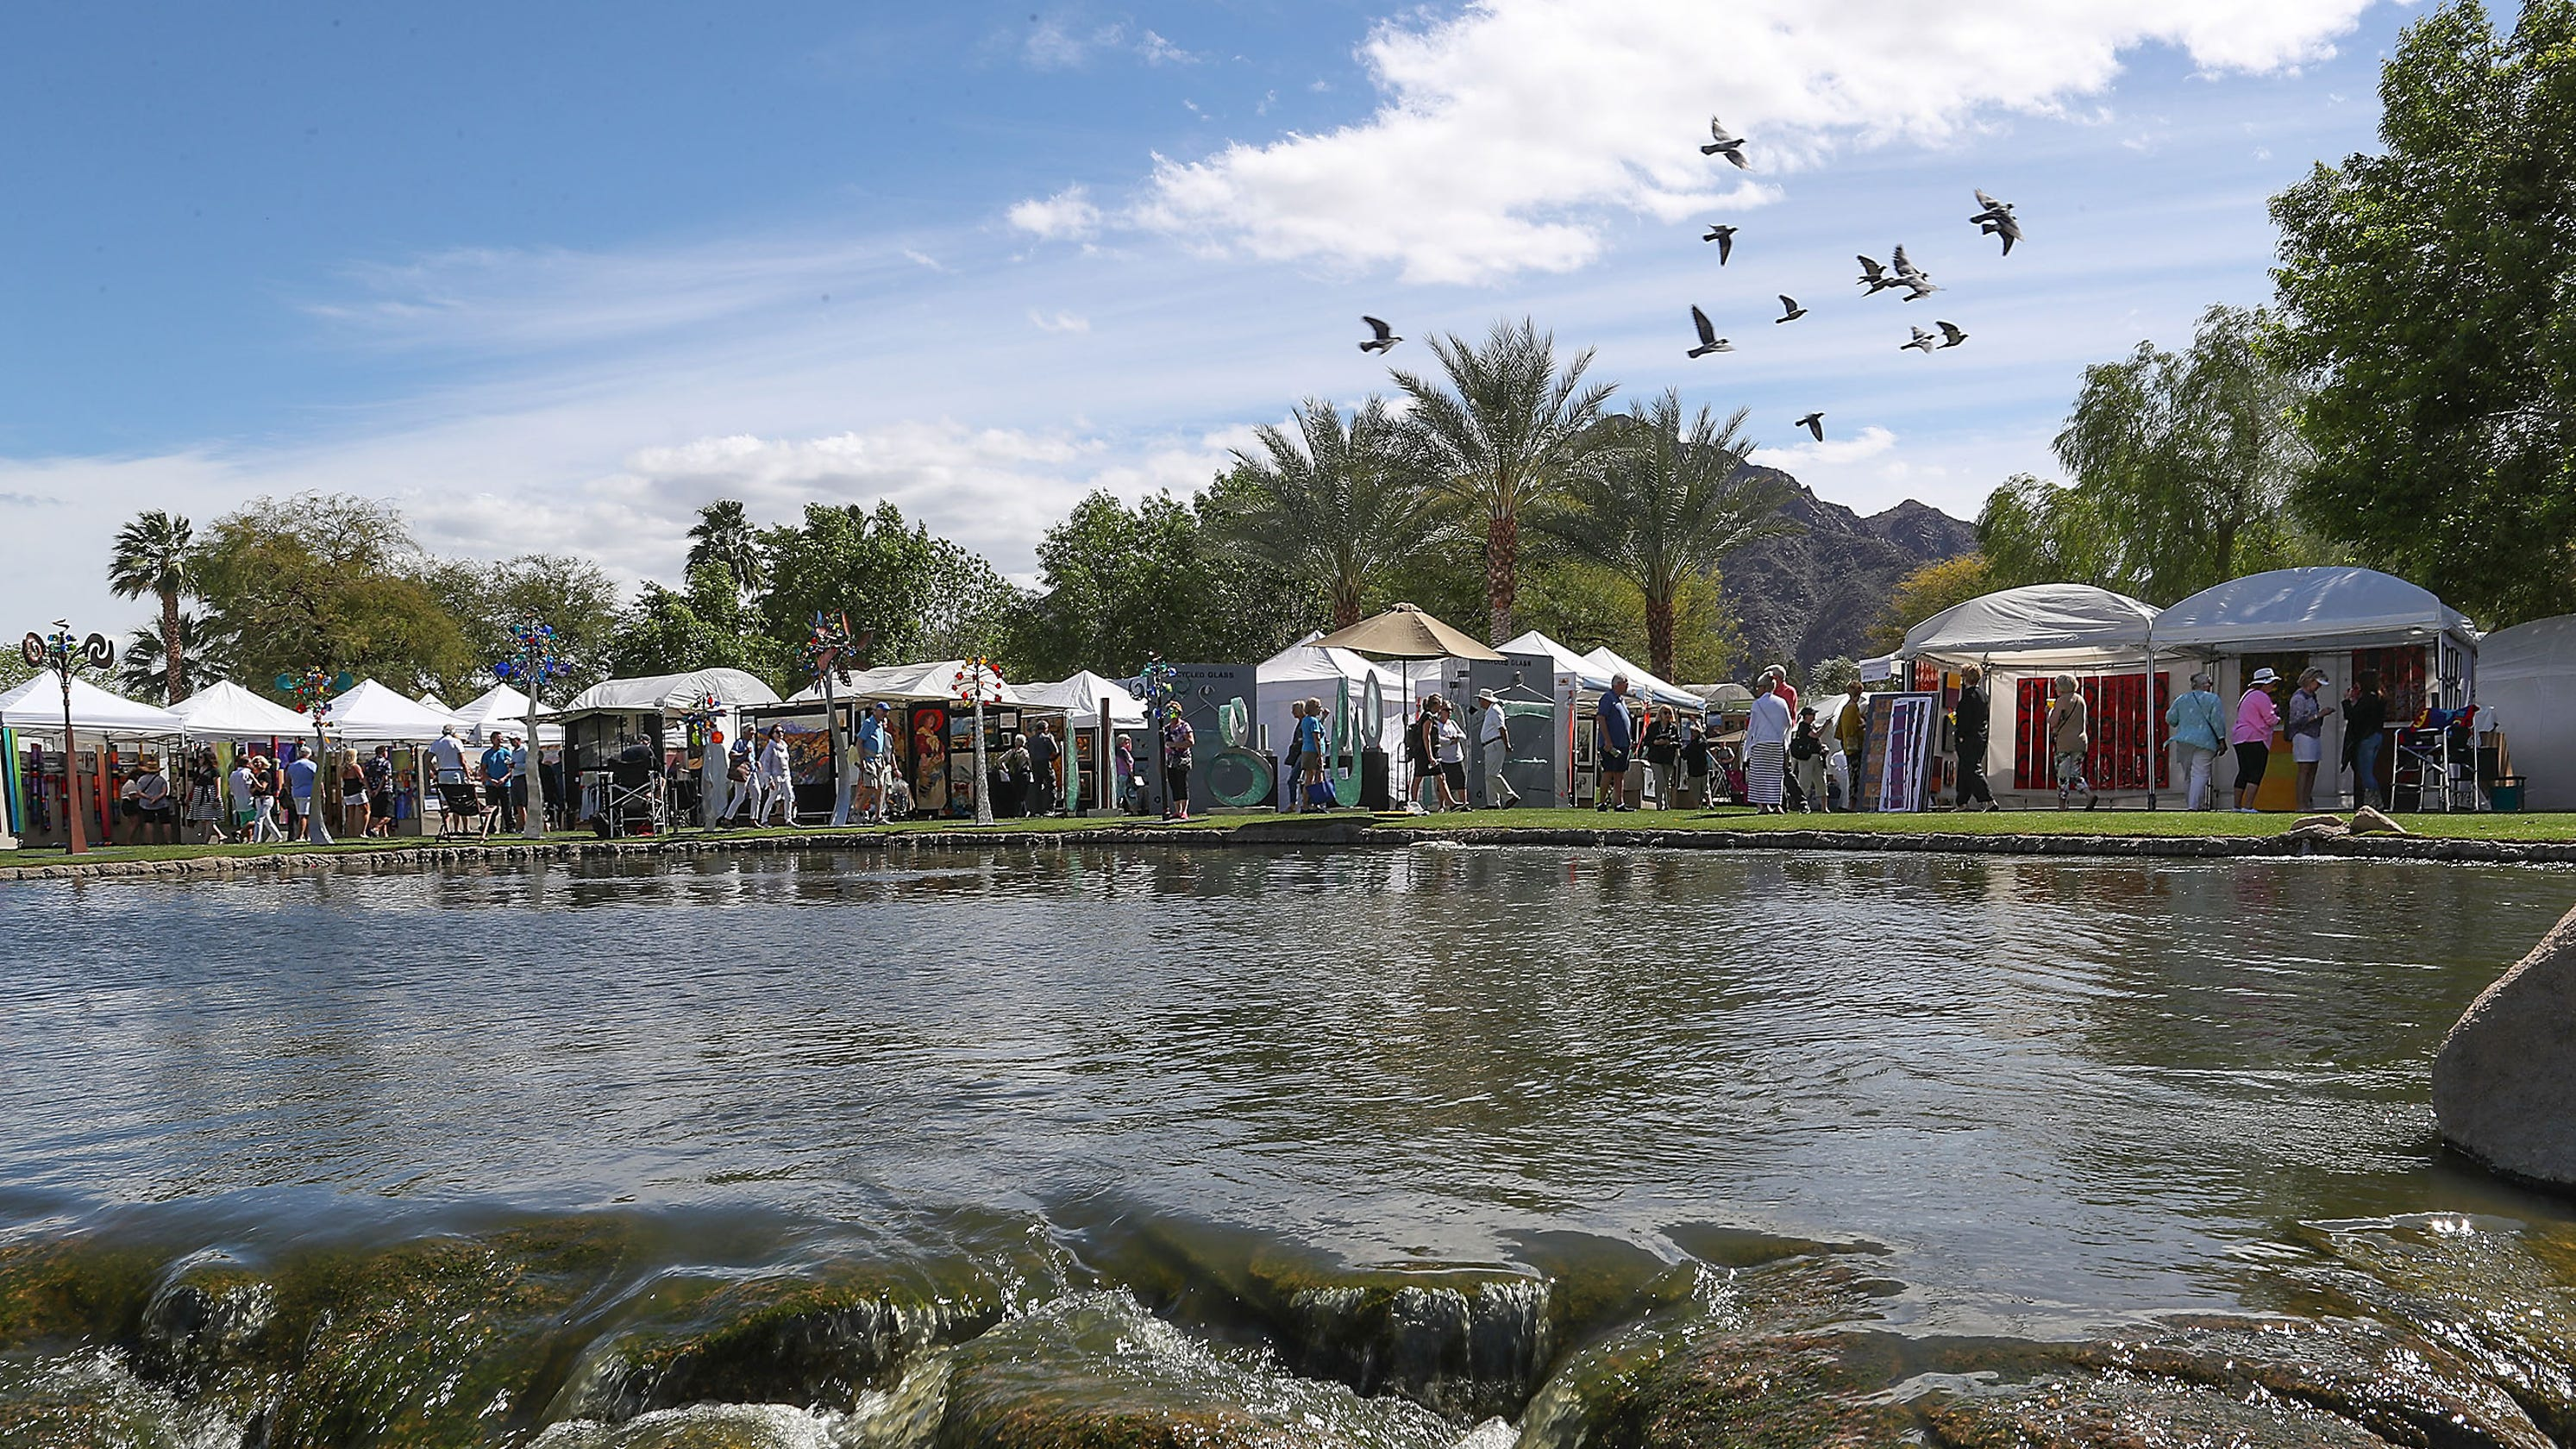 Sausalito Art Festival 2020 La Quinta council names Paul Anderson new arts festival promoter